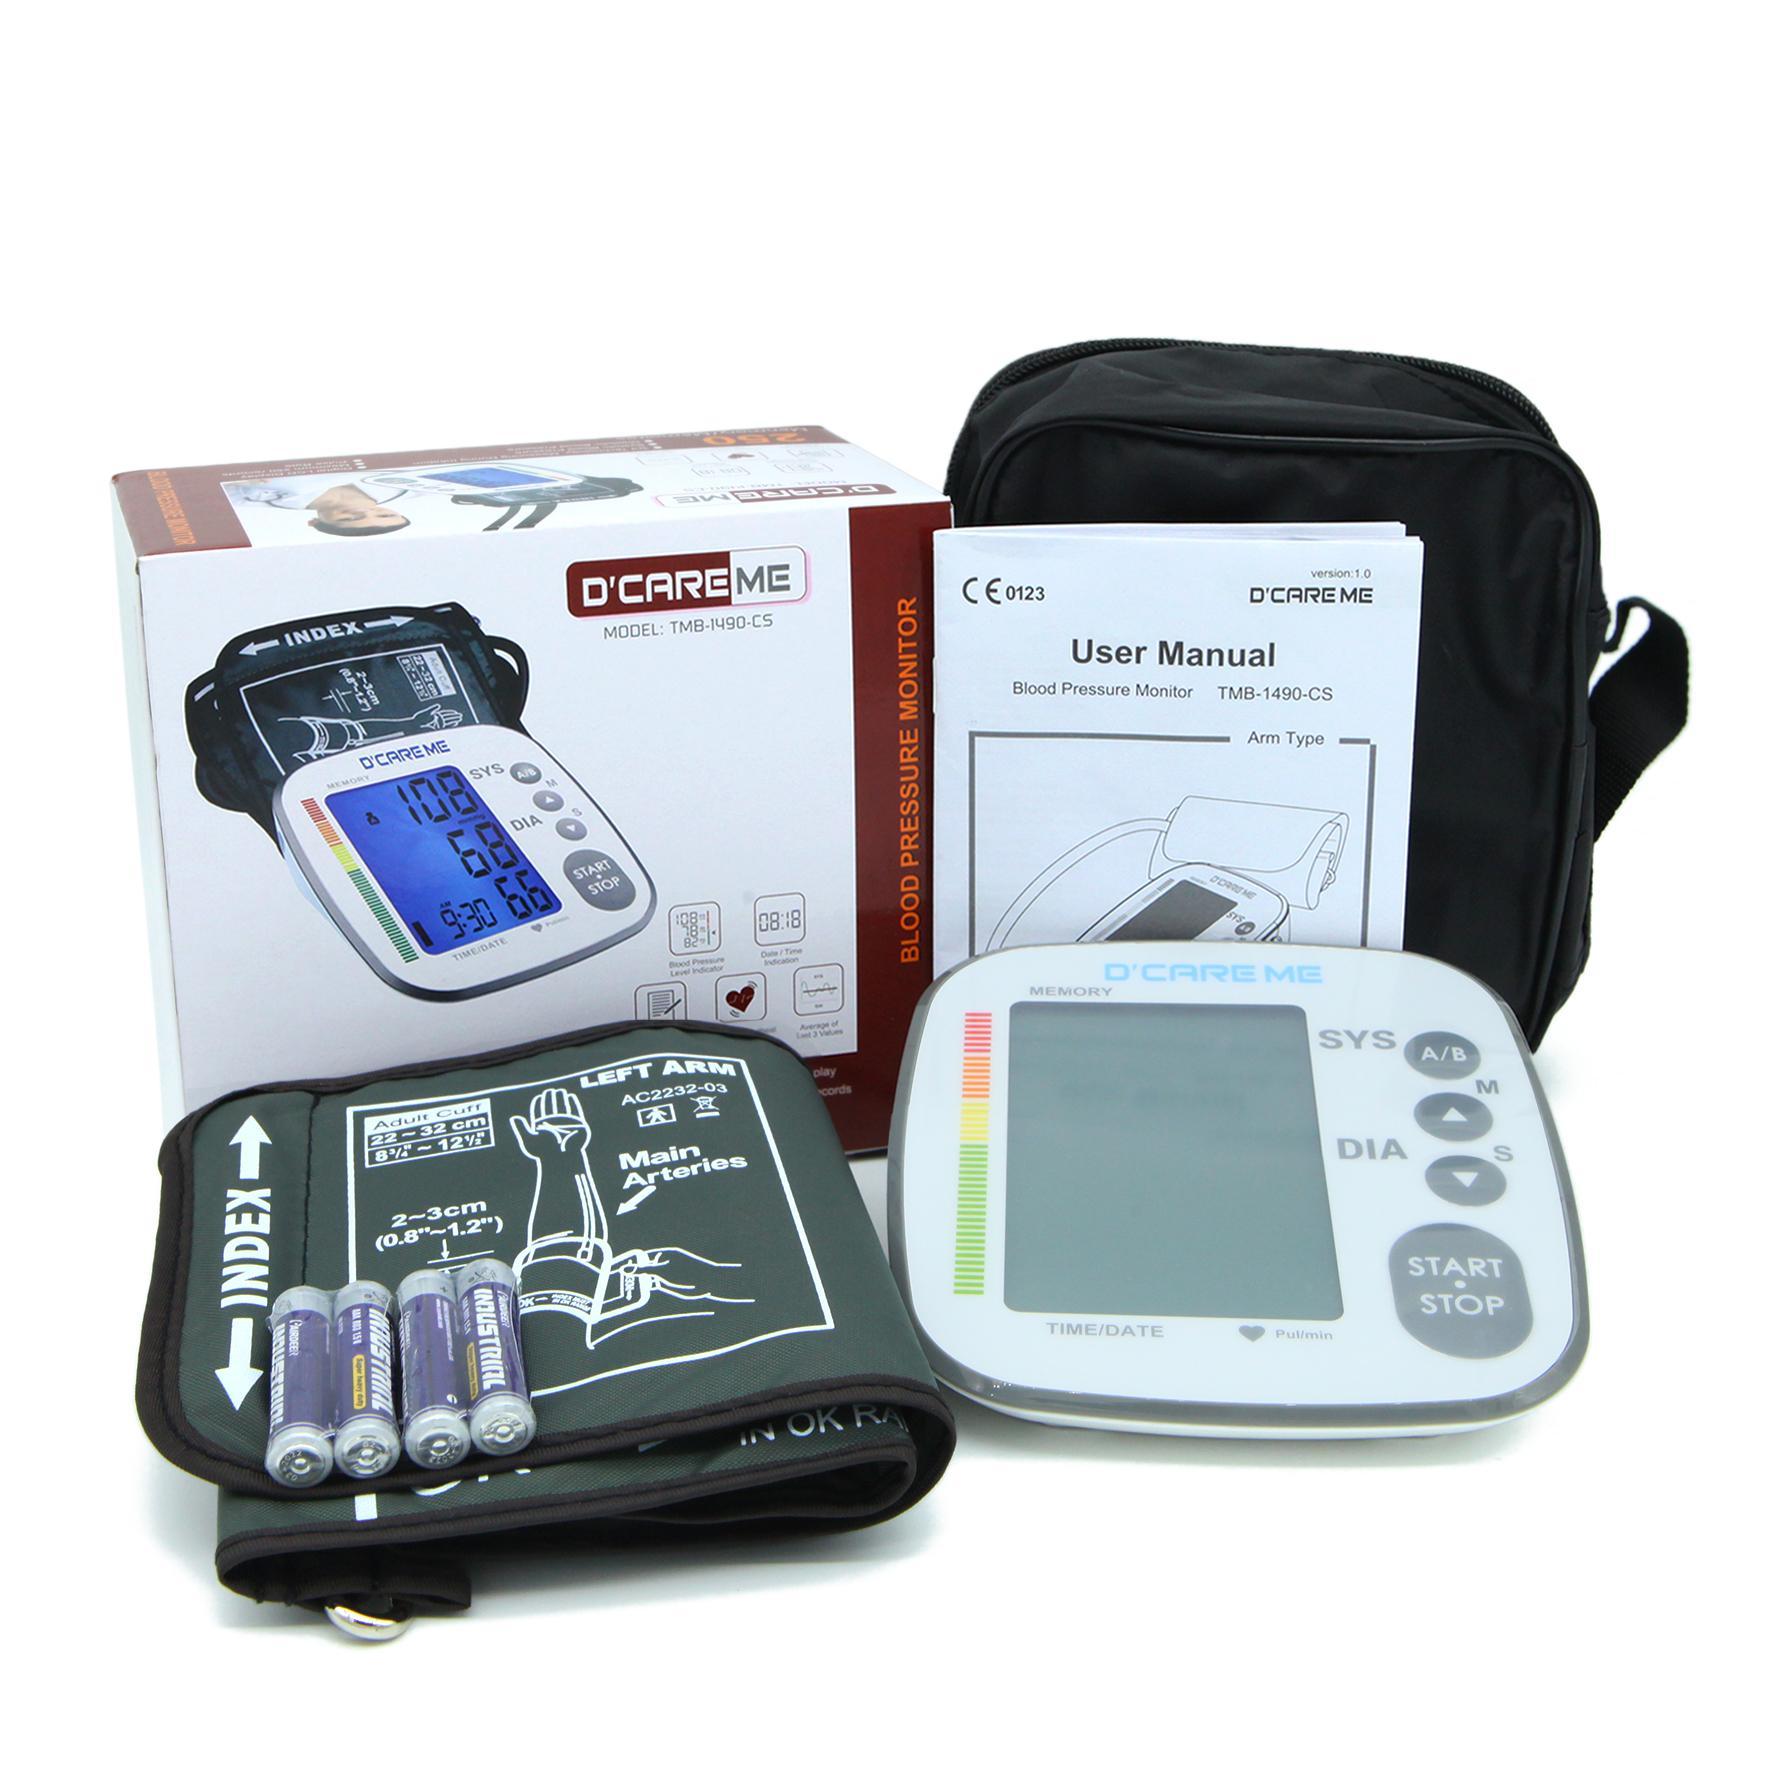 Nơi bán Máy đo huyết áp bắp tay Dcareme